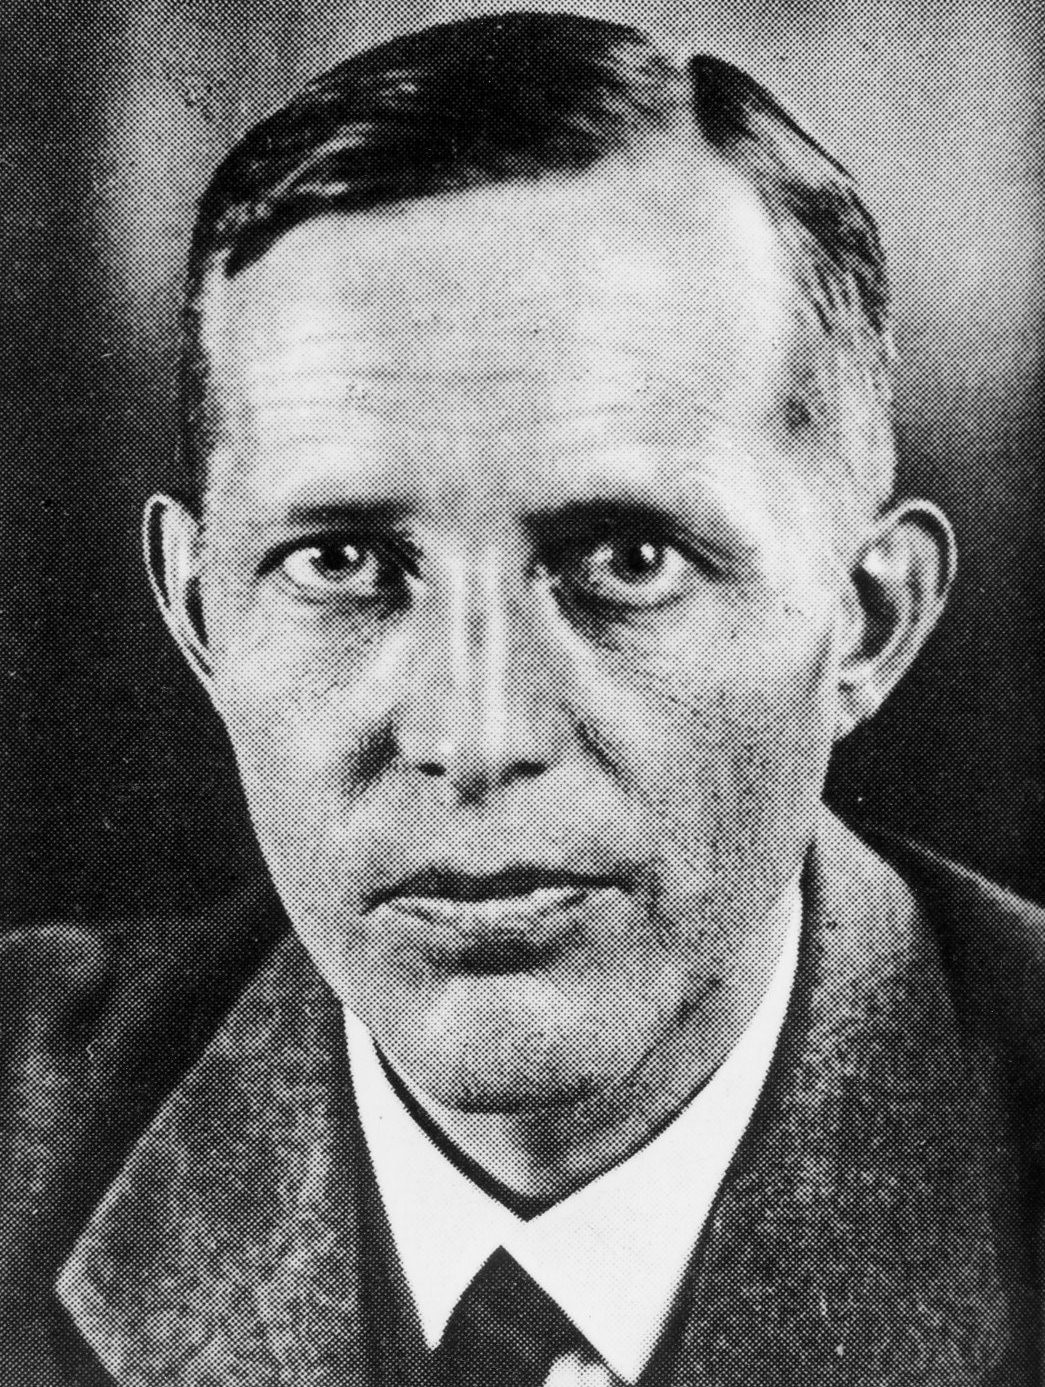 Шверин фон Крозиг Людвиг (Johann Ludwig Graf Schwerin von Krosigk) (22.08.1887 - 04.03.1977)